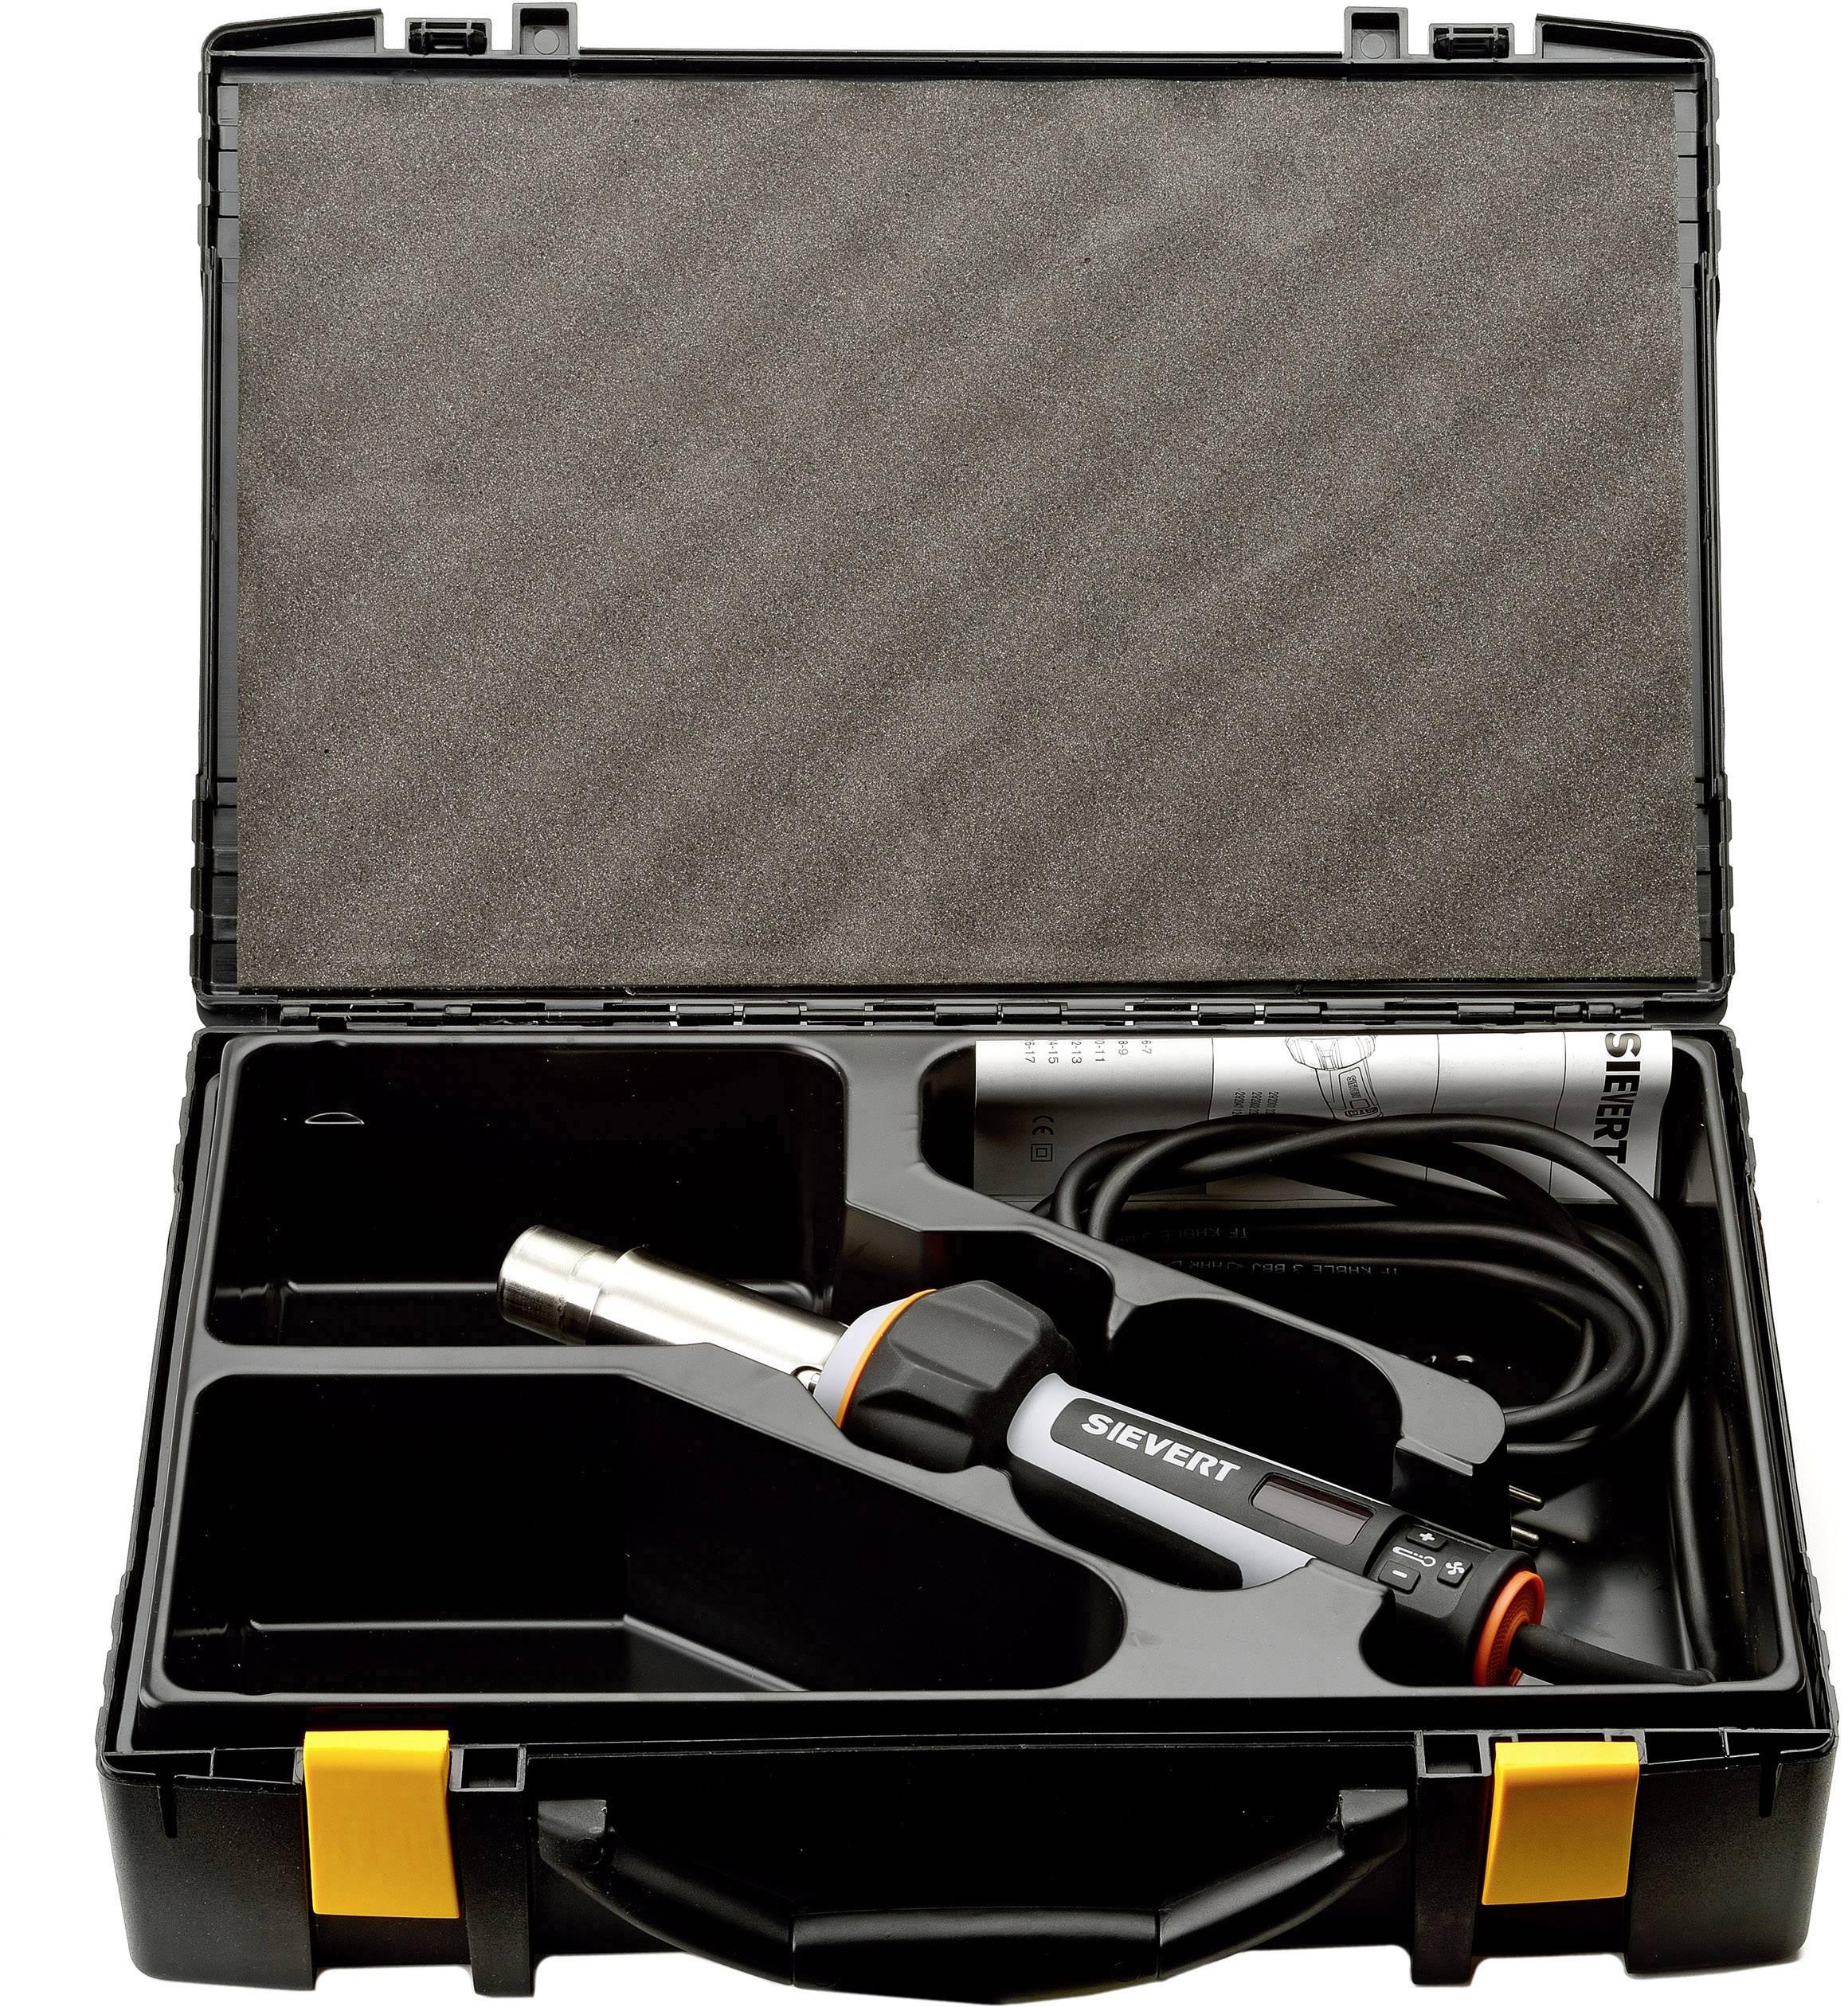 Teplovzdušná pištoľ Sievert DW3000 293001, 2000 W